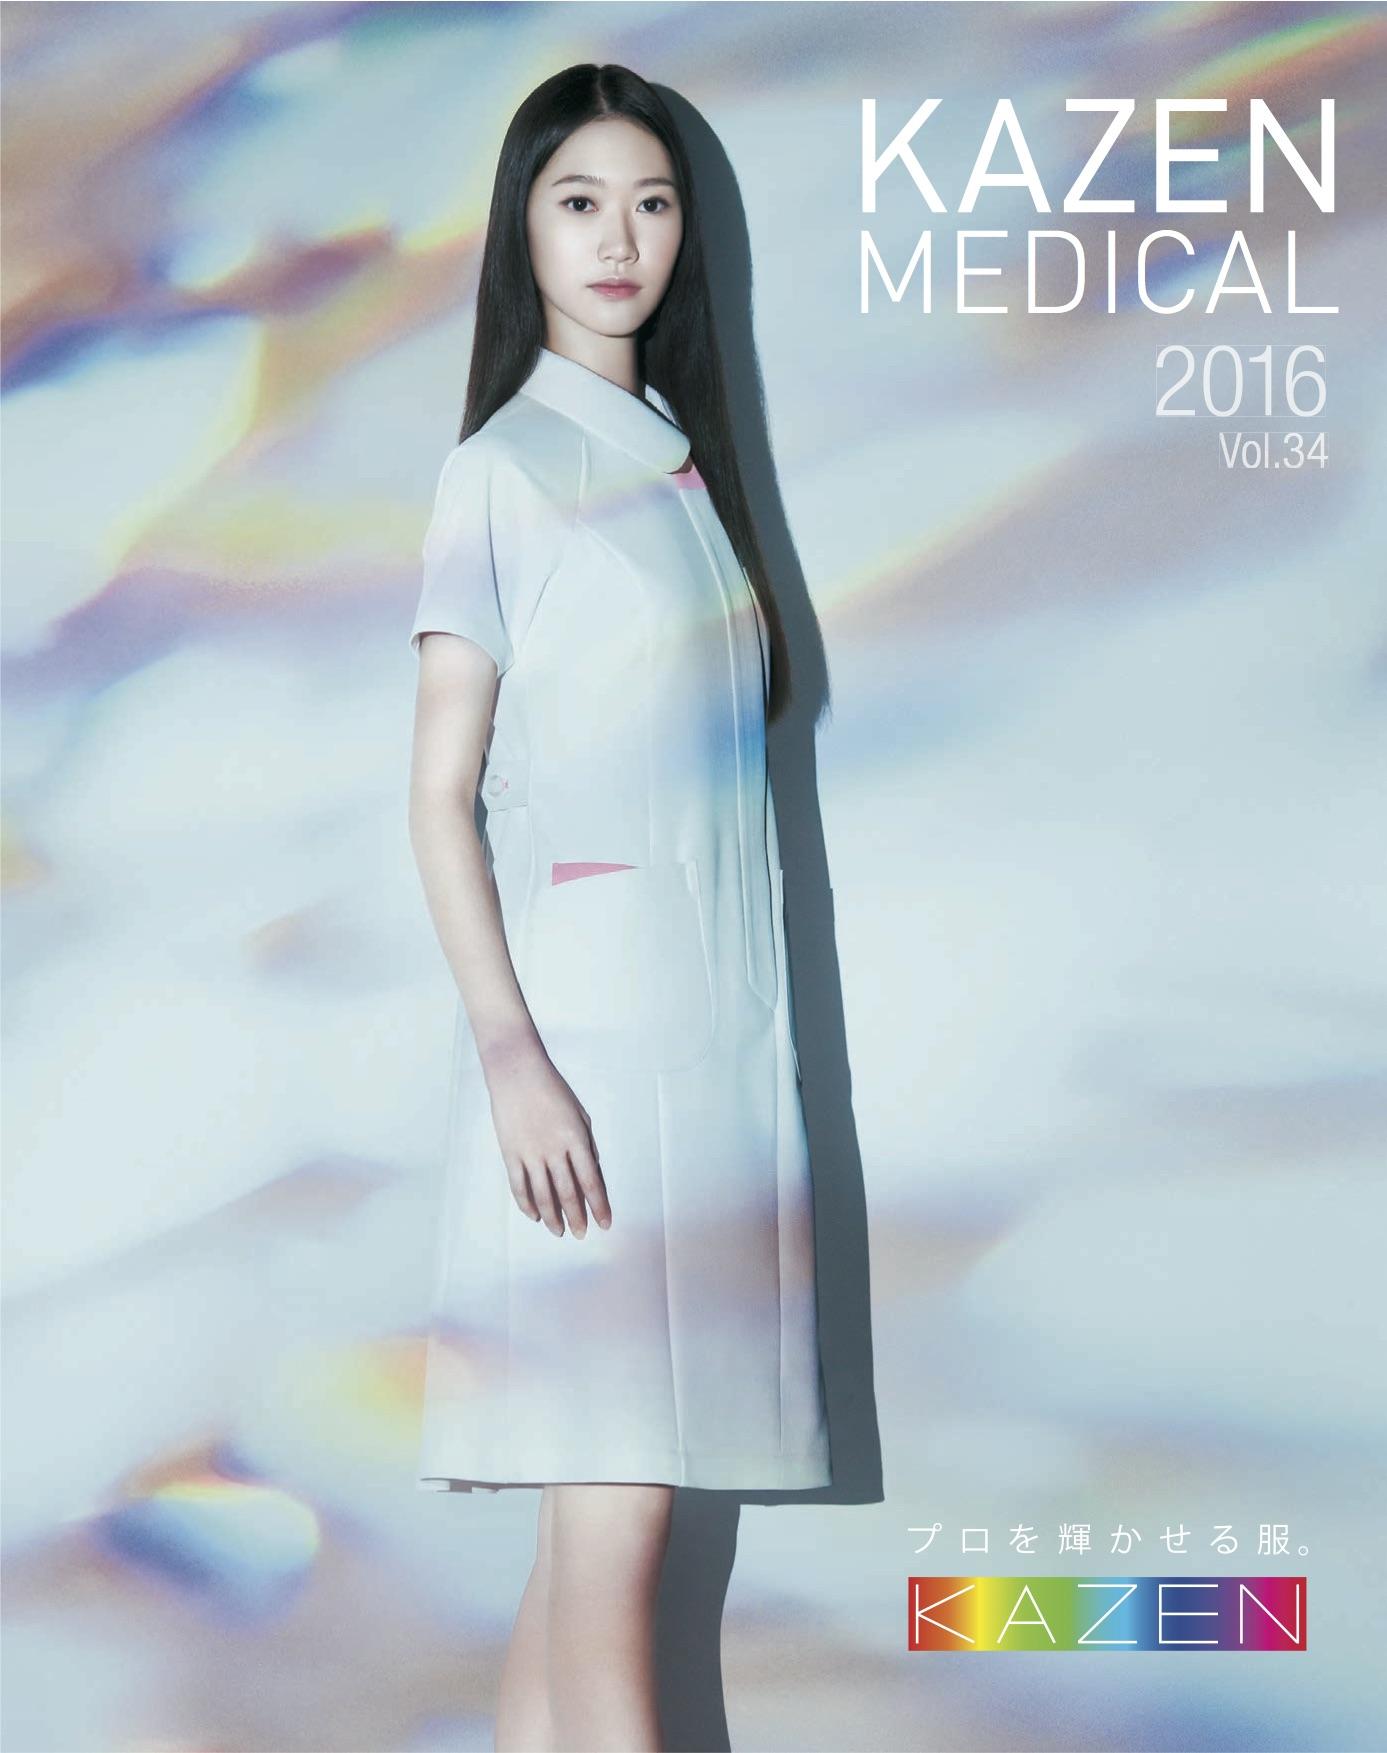 KAZEN MEDICAL 2016